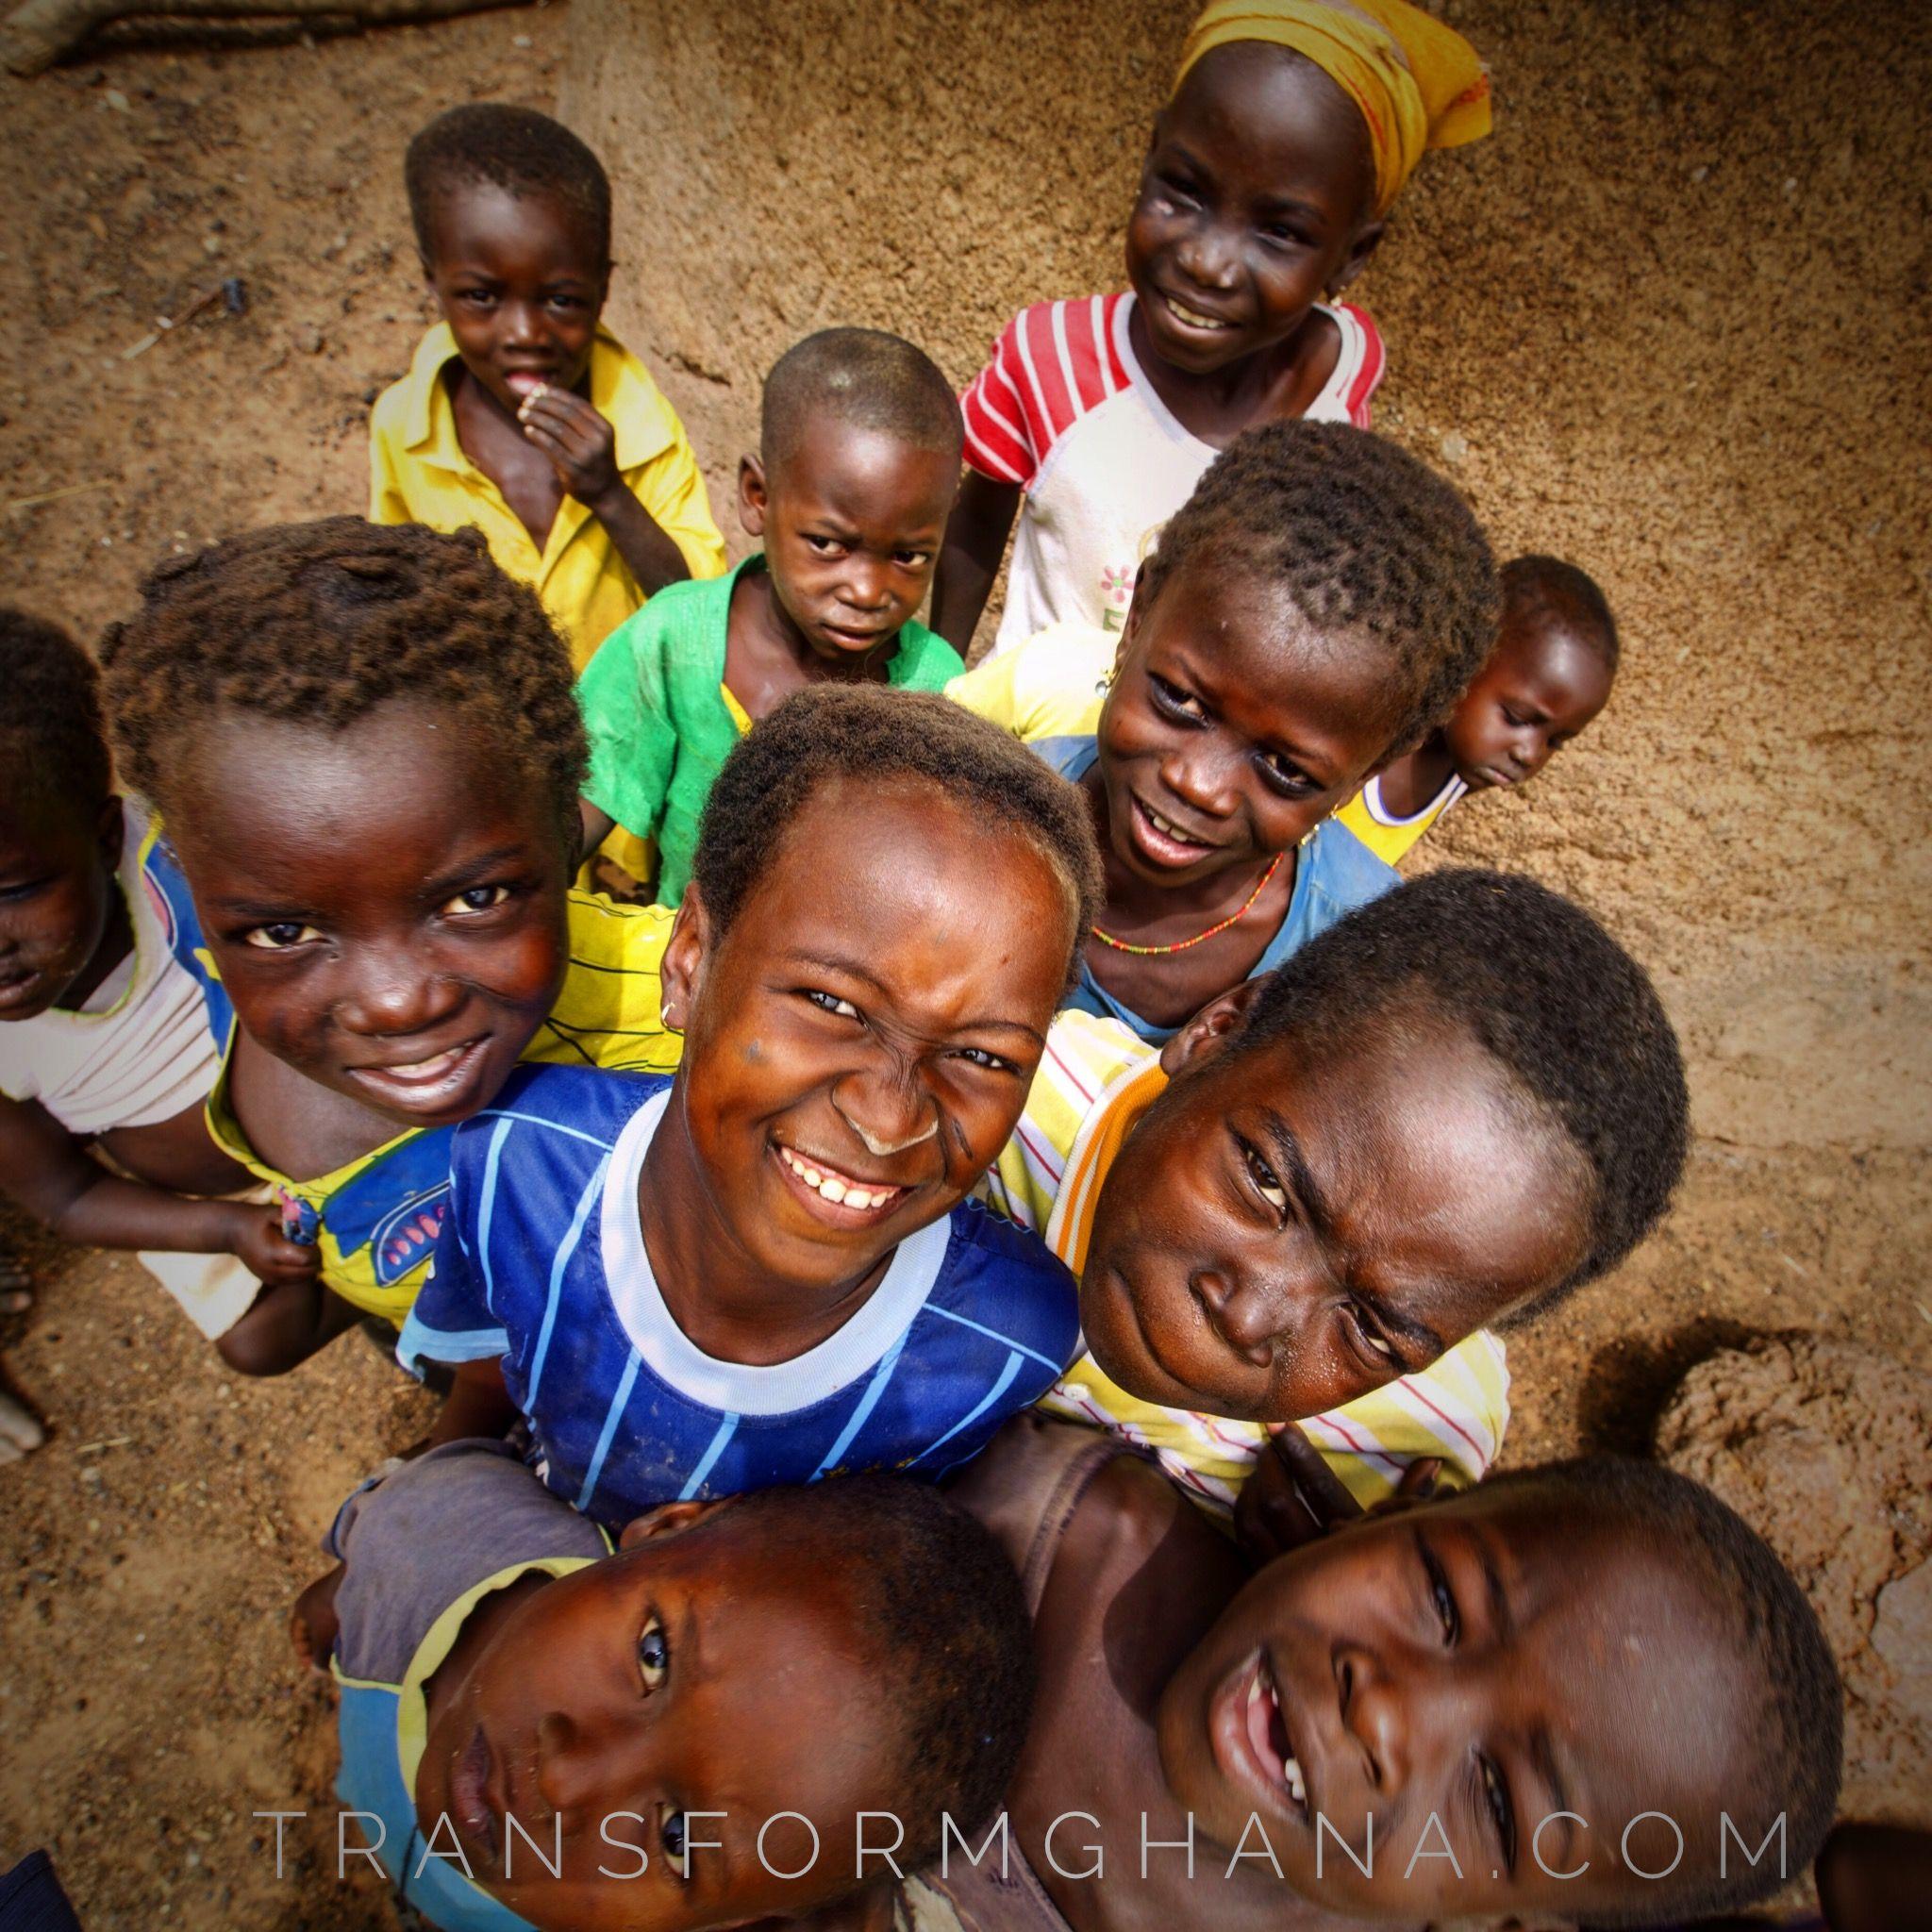 http://transformghana.com/give/childsponsorship